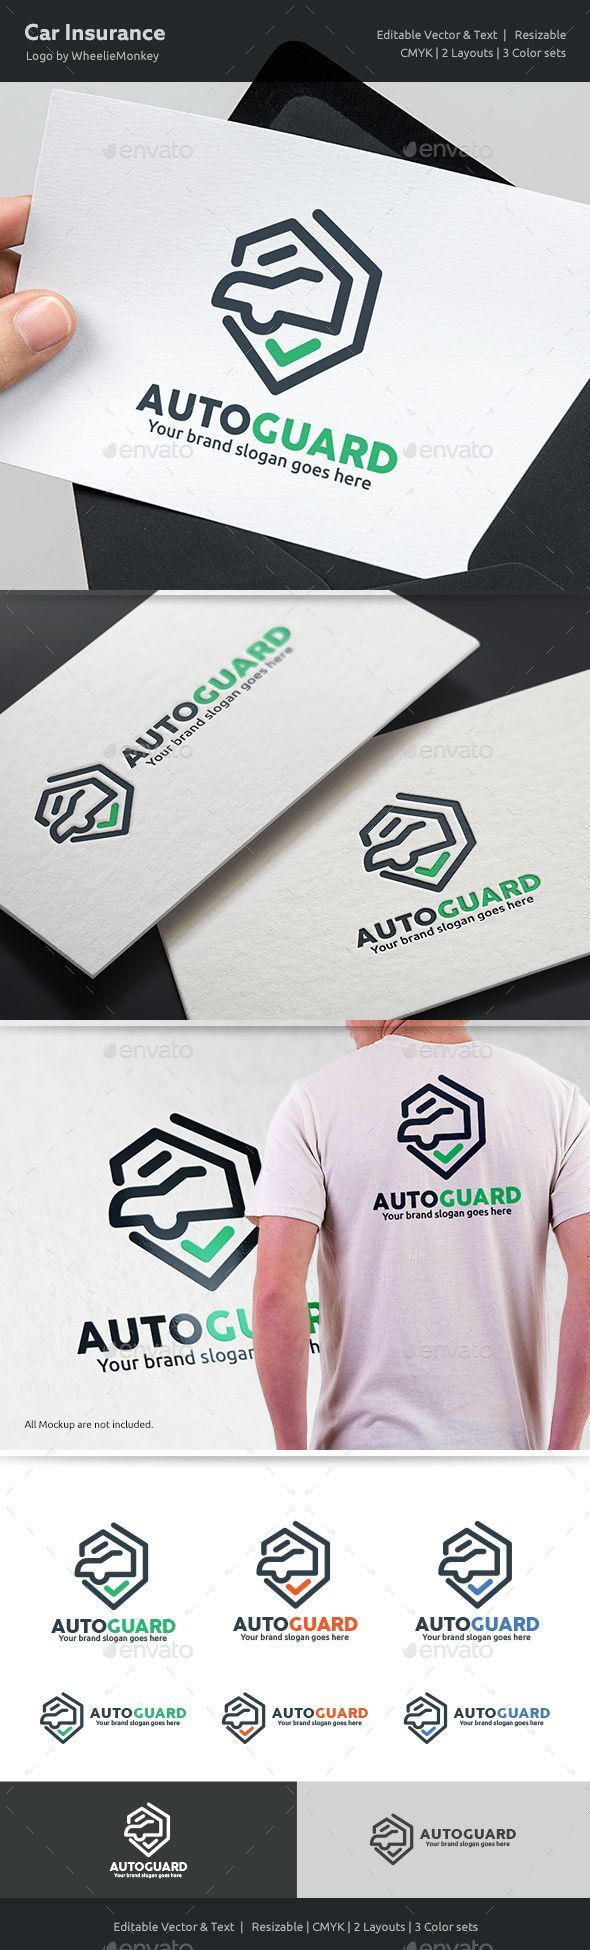 Car body sticker design eps - Car Insurance Logo